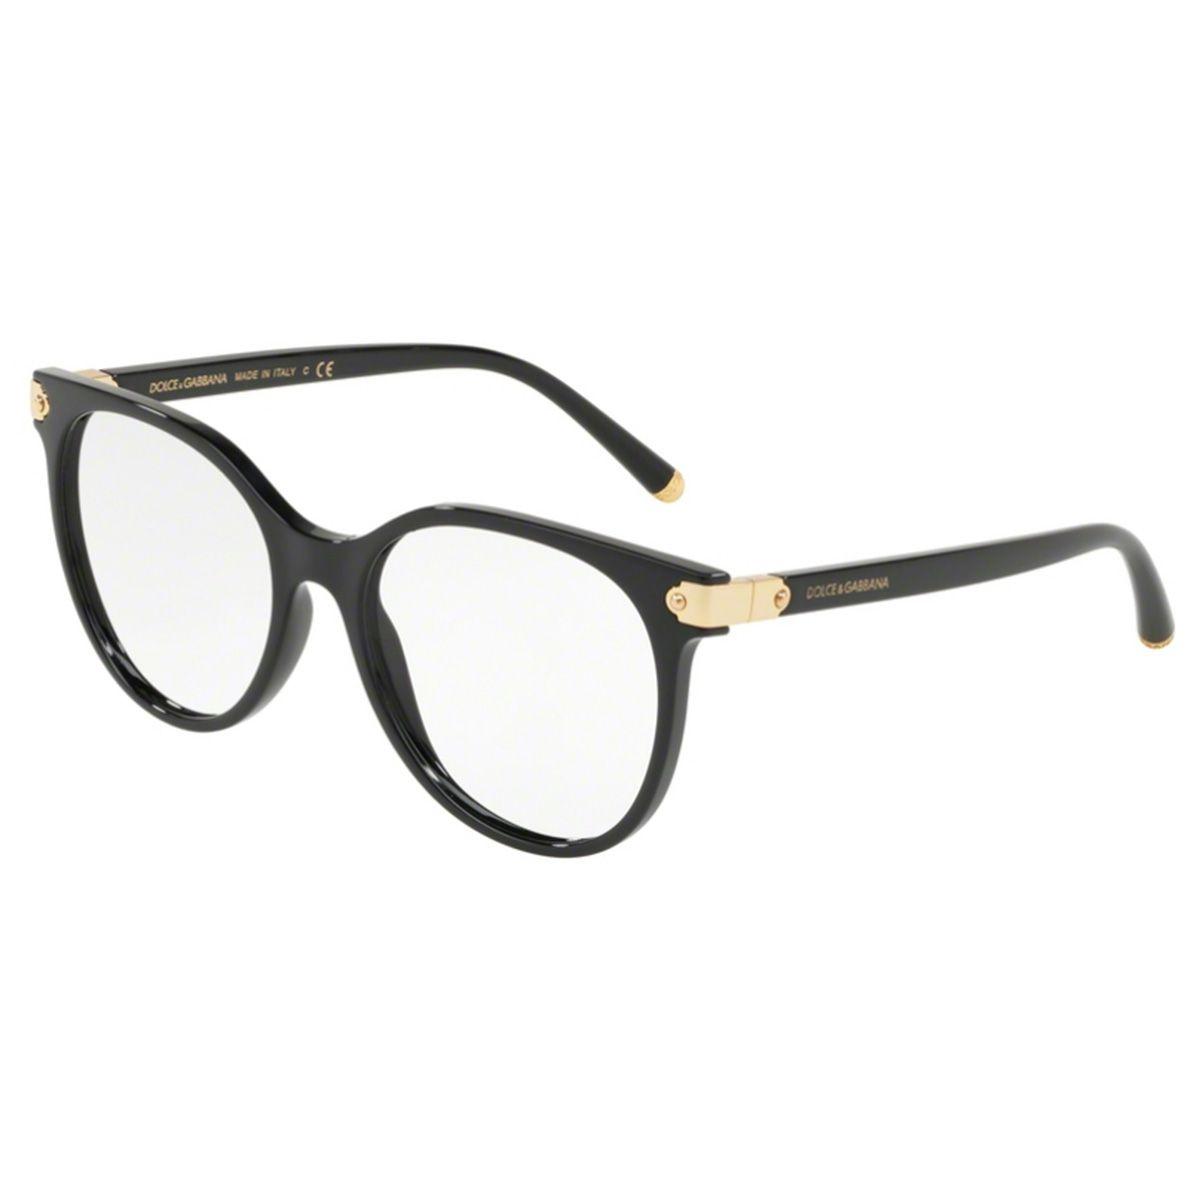 Óculos de Grau Dolce & Gabbana Preto DG5032 - 501/53